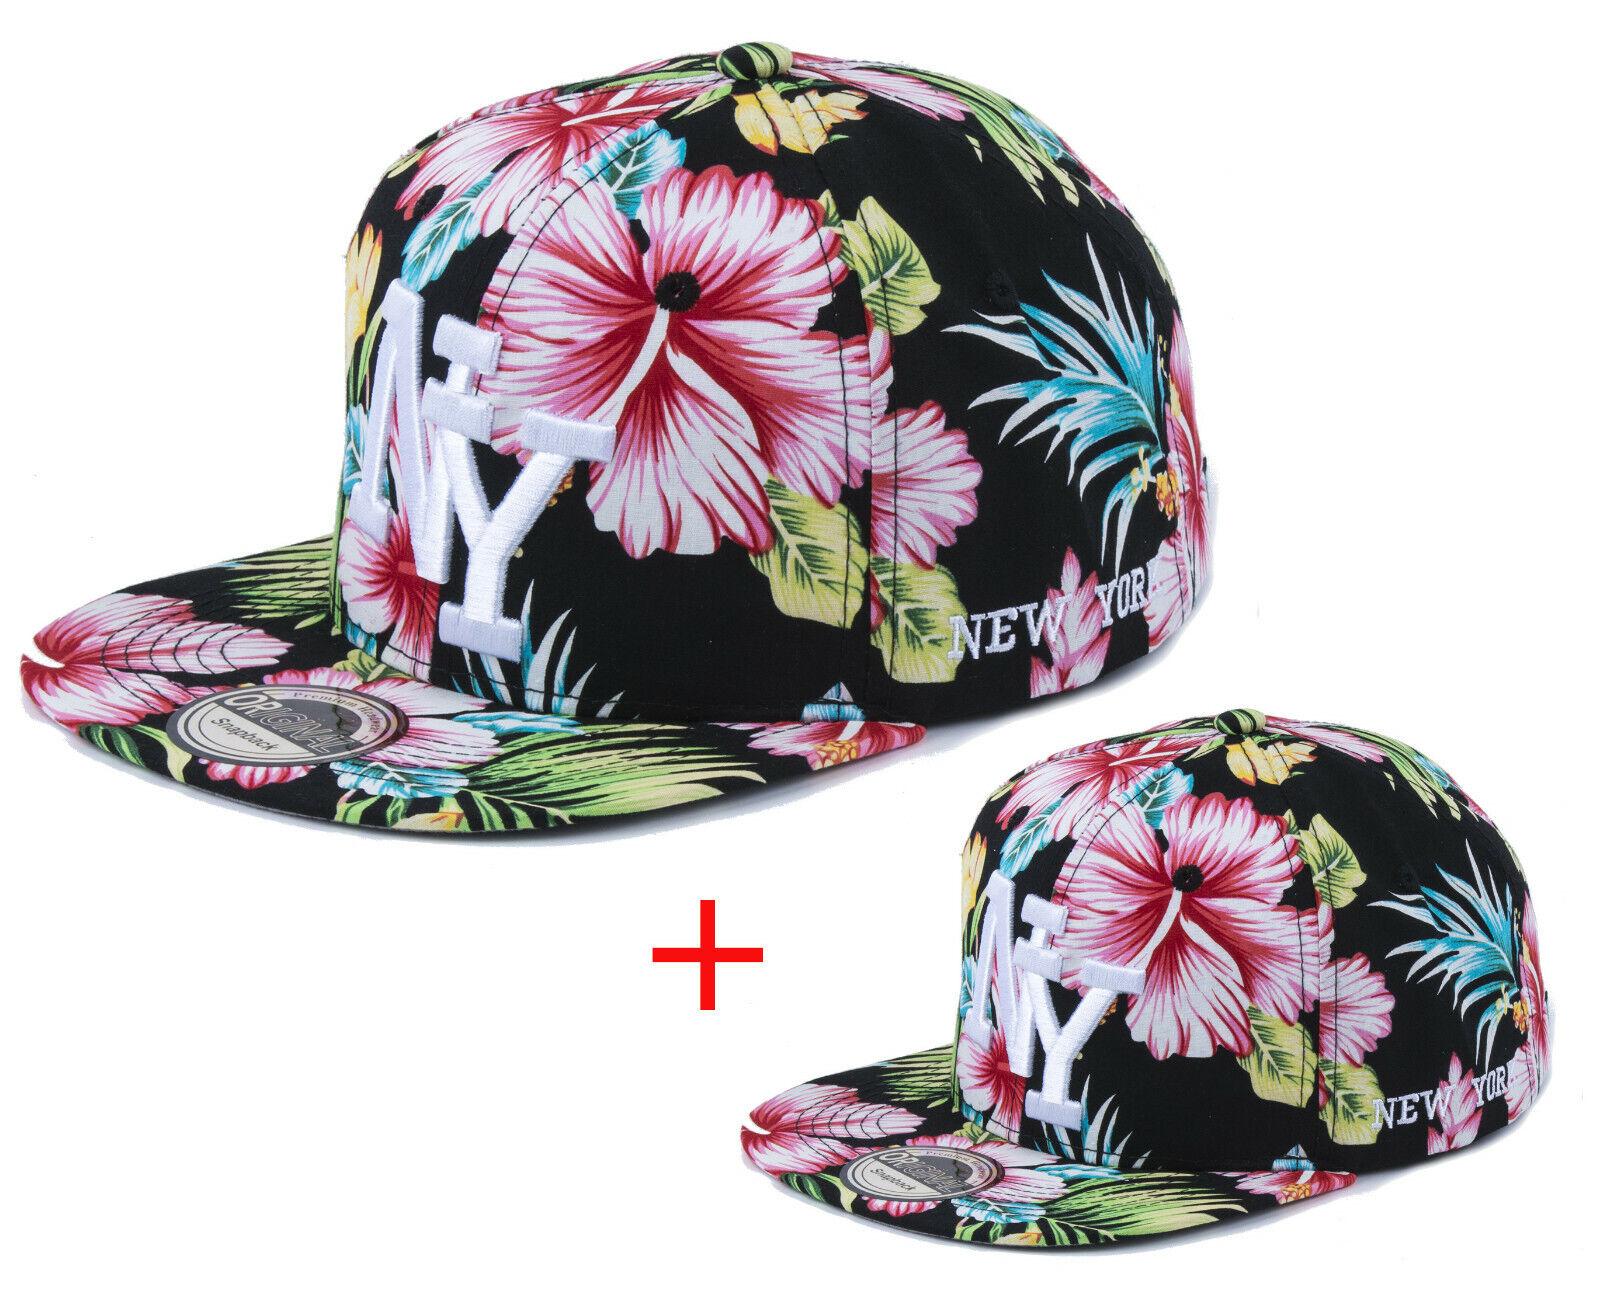 Vater + Sohn Cappy Set Herren Junge klein + groß Kappe Cap NY New York Hawaii